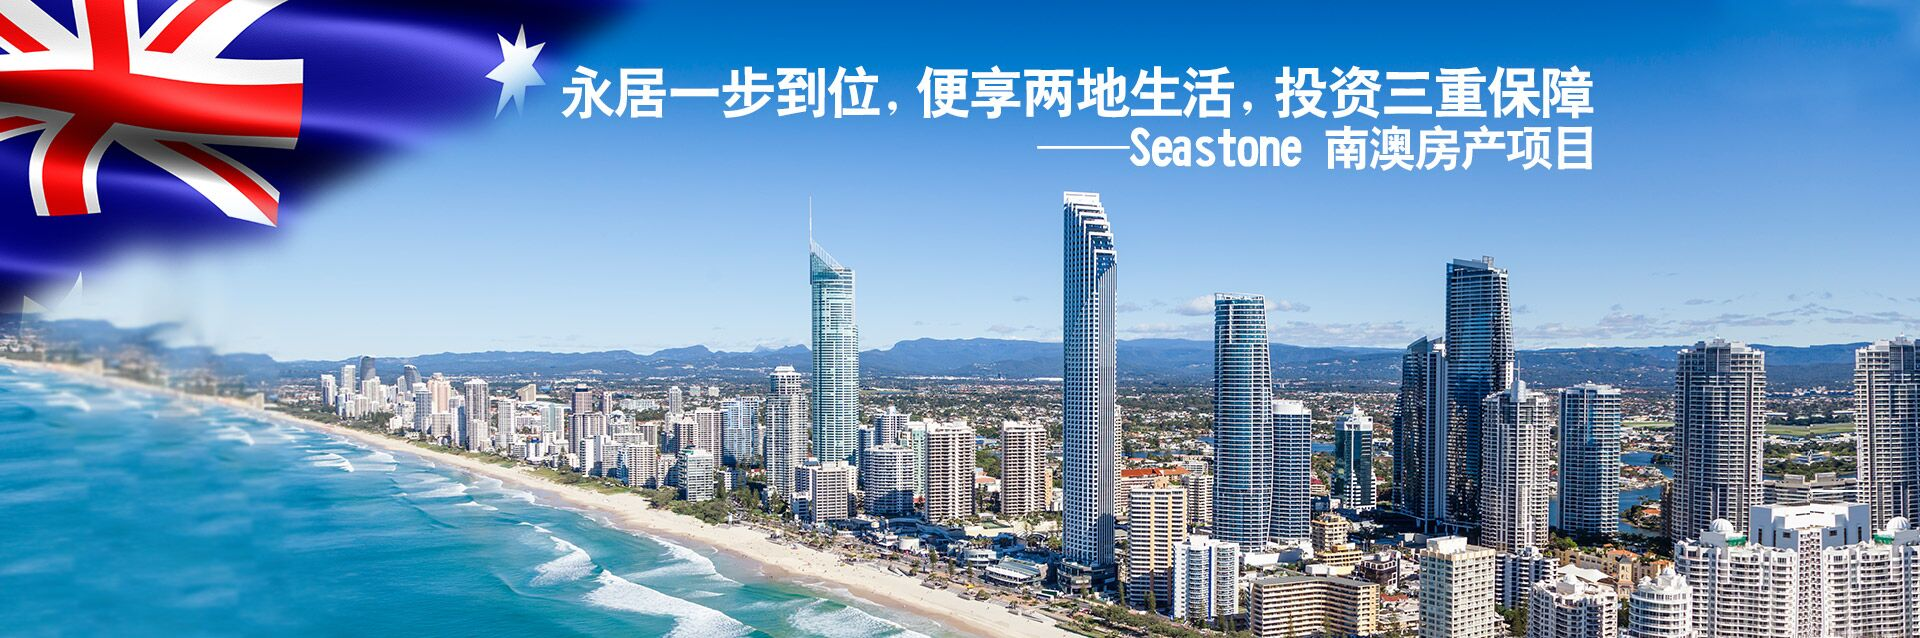 南澳132Seastone